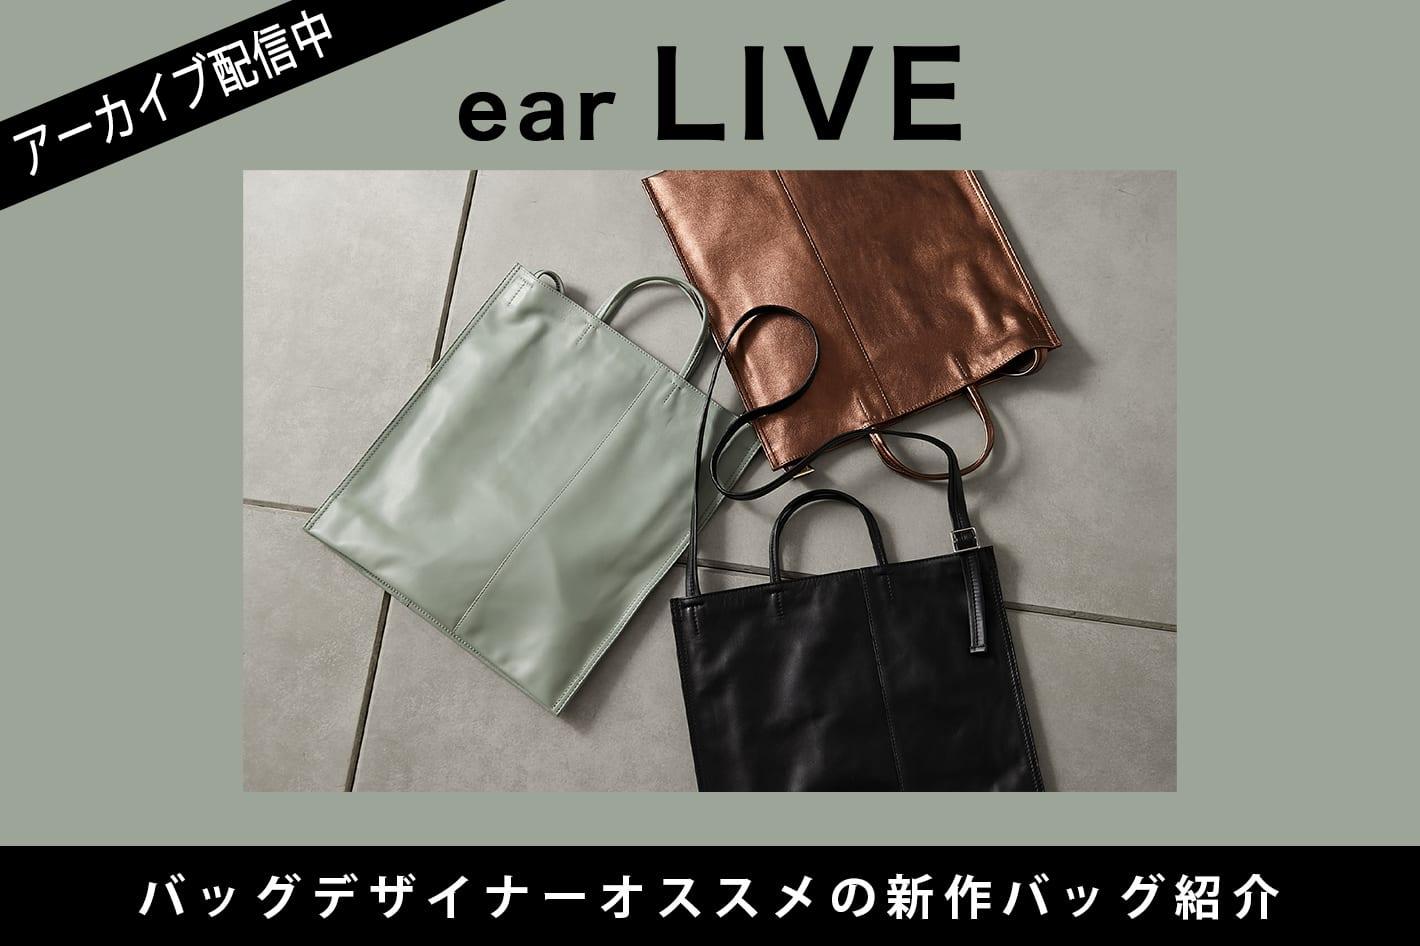 ear PAPILLONNER <ear LIVE>アーカイブ配信中!バッグデザイナーオススメの新作バッグ紹介